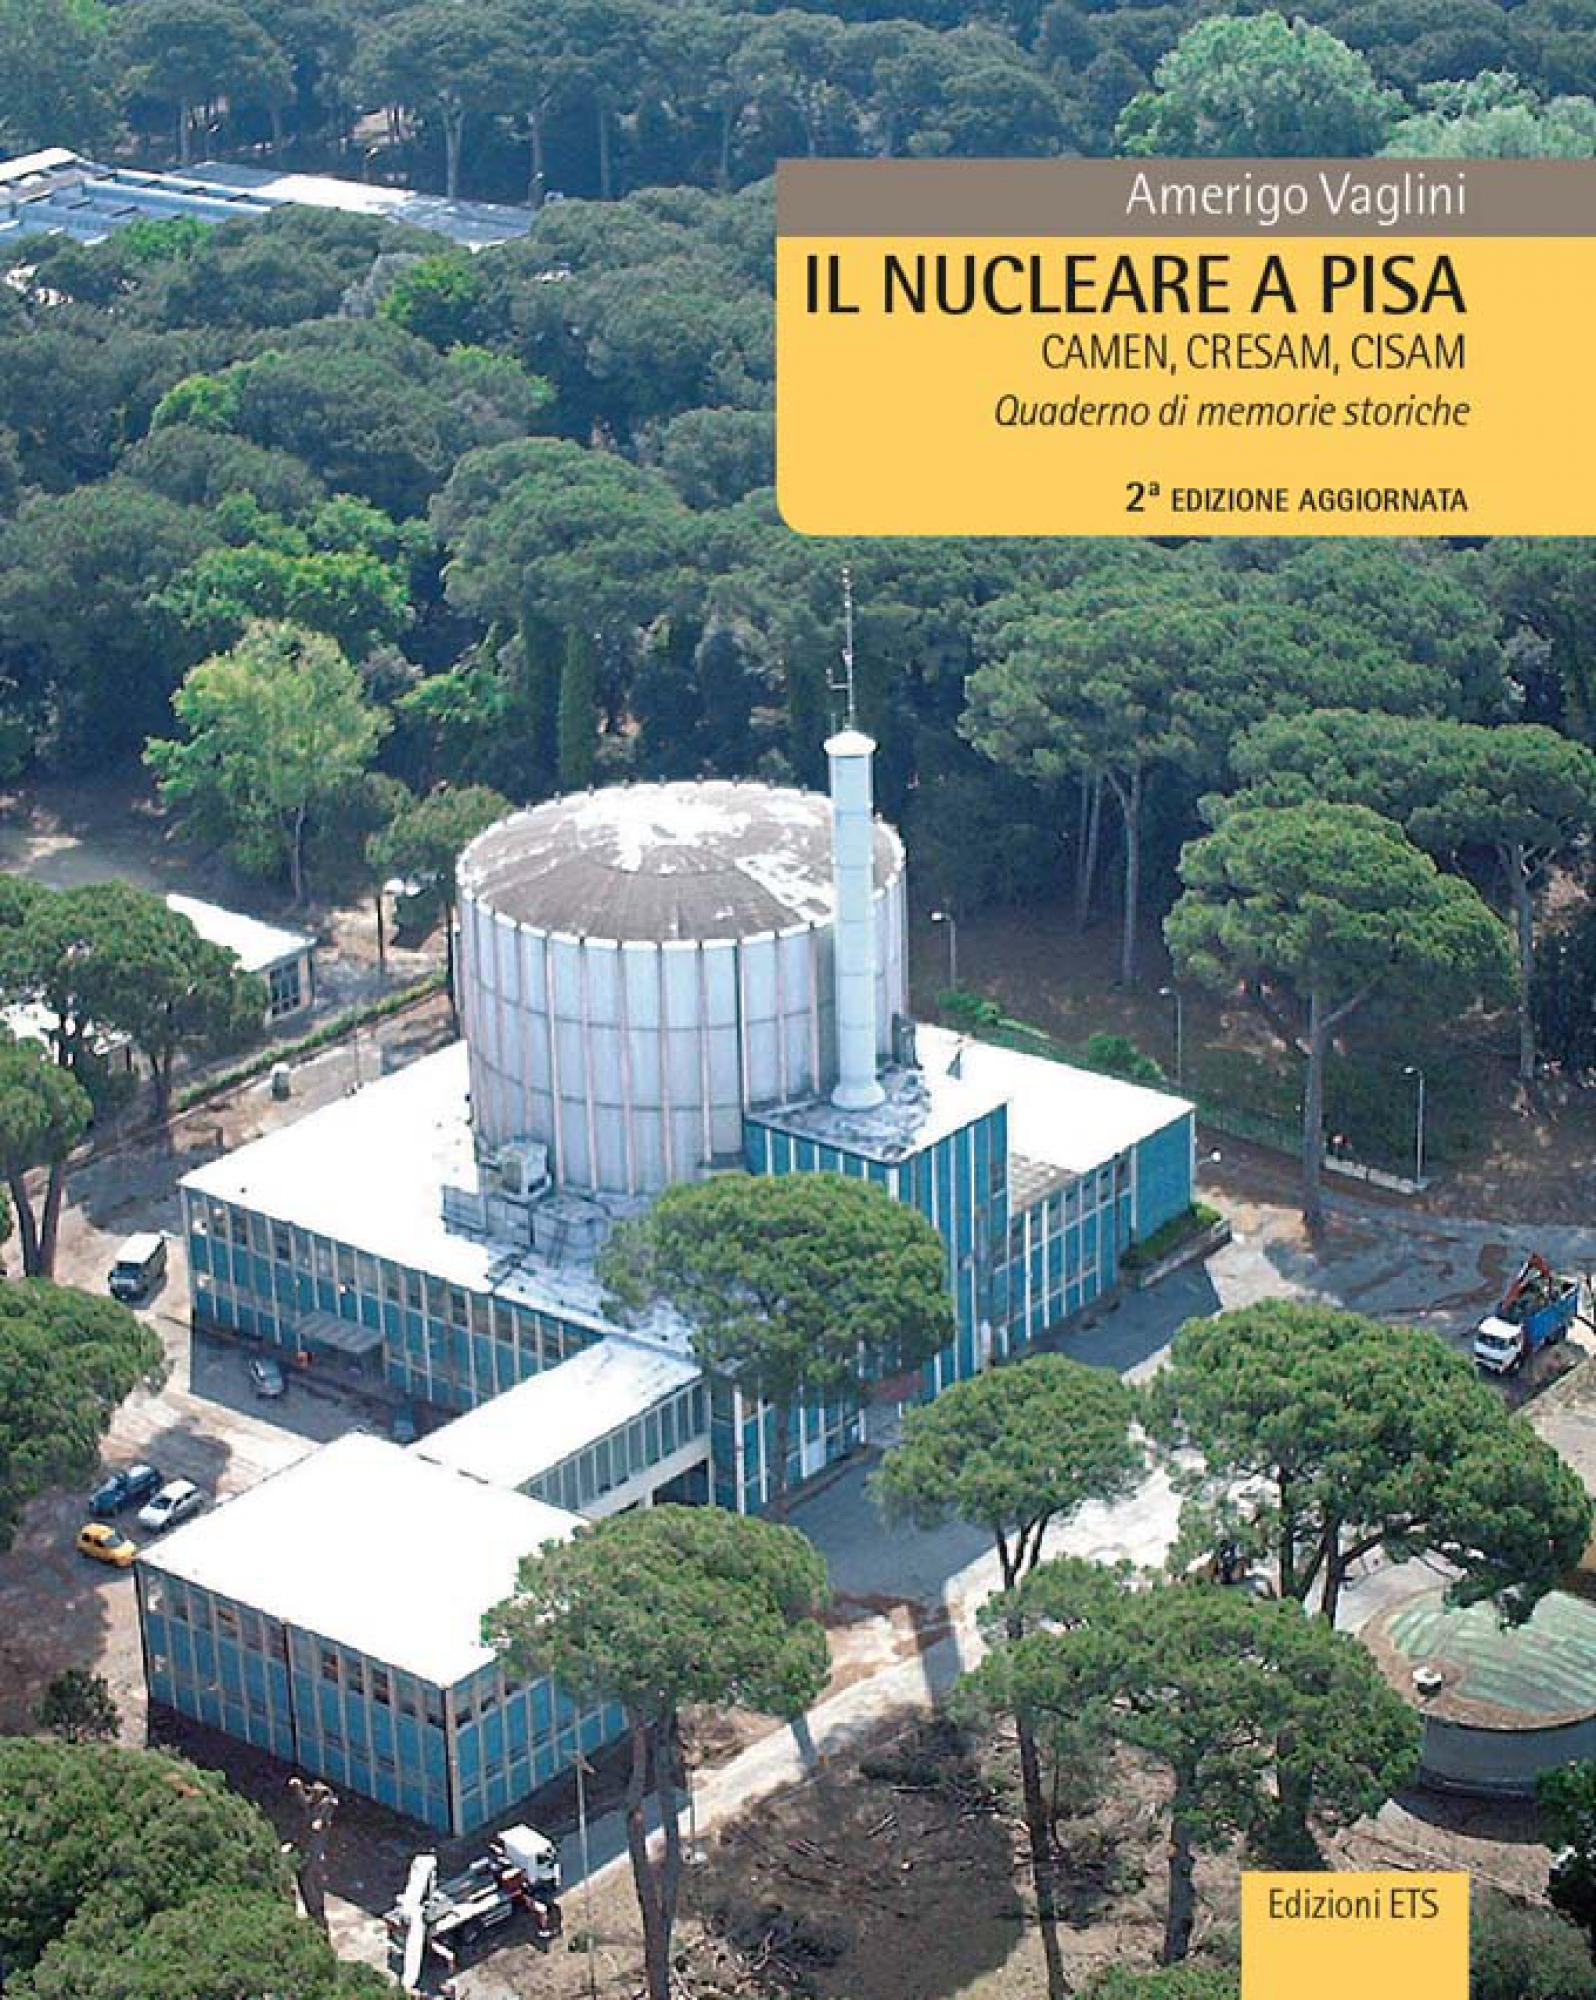 Il nucleare a Pisa.CAMEN, CRESAM, CISAM. Quaderno di memorie storiche